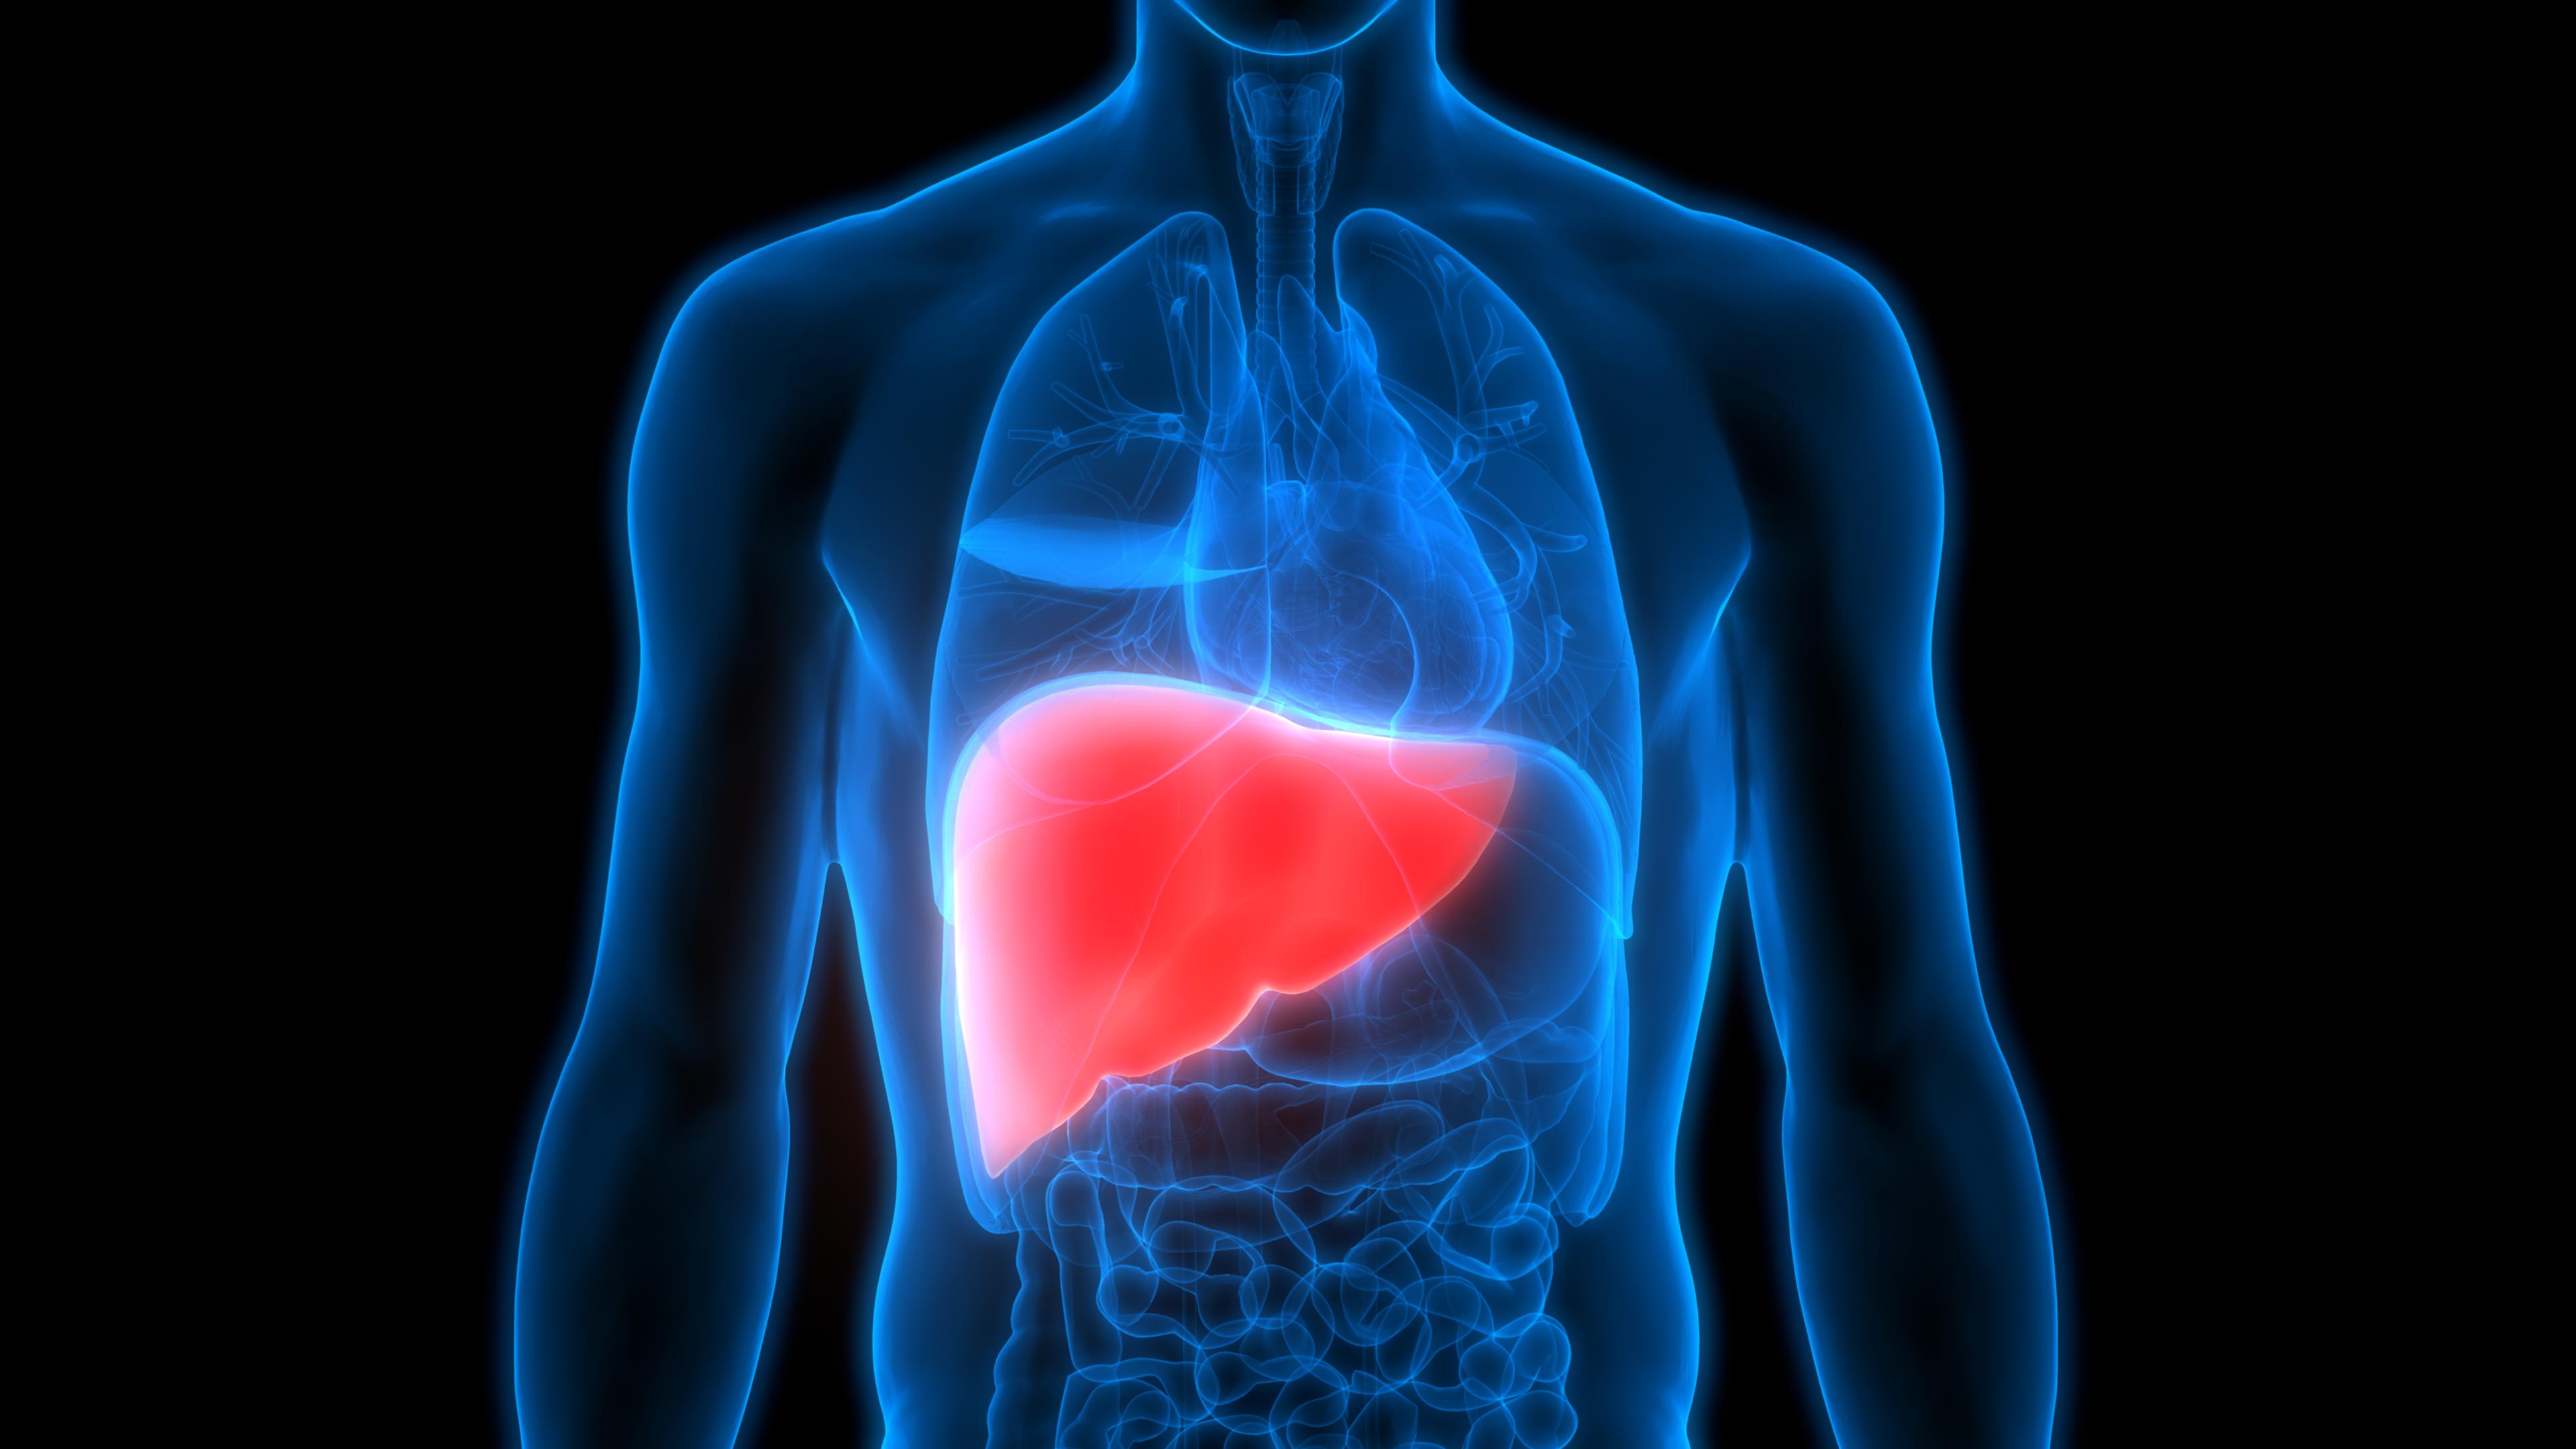 Human Body Organs Anatomy (Liver)